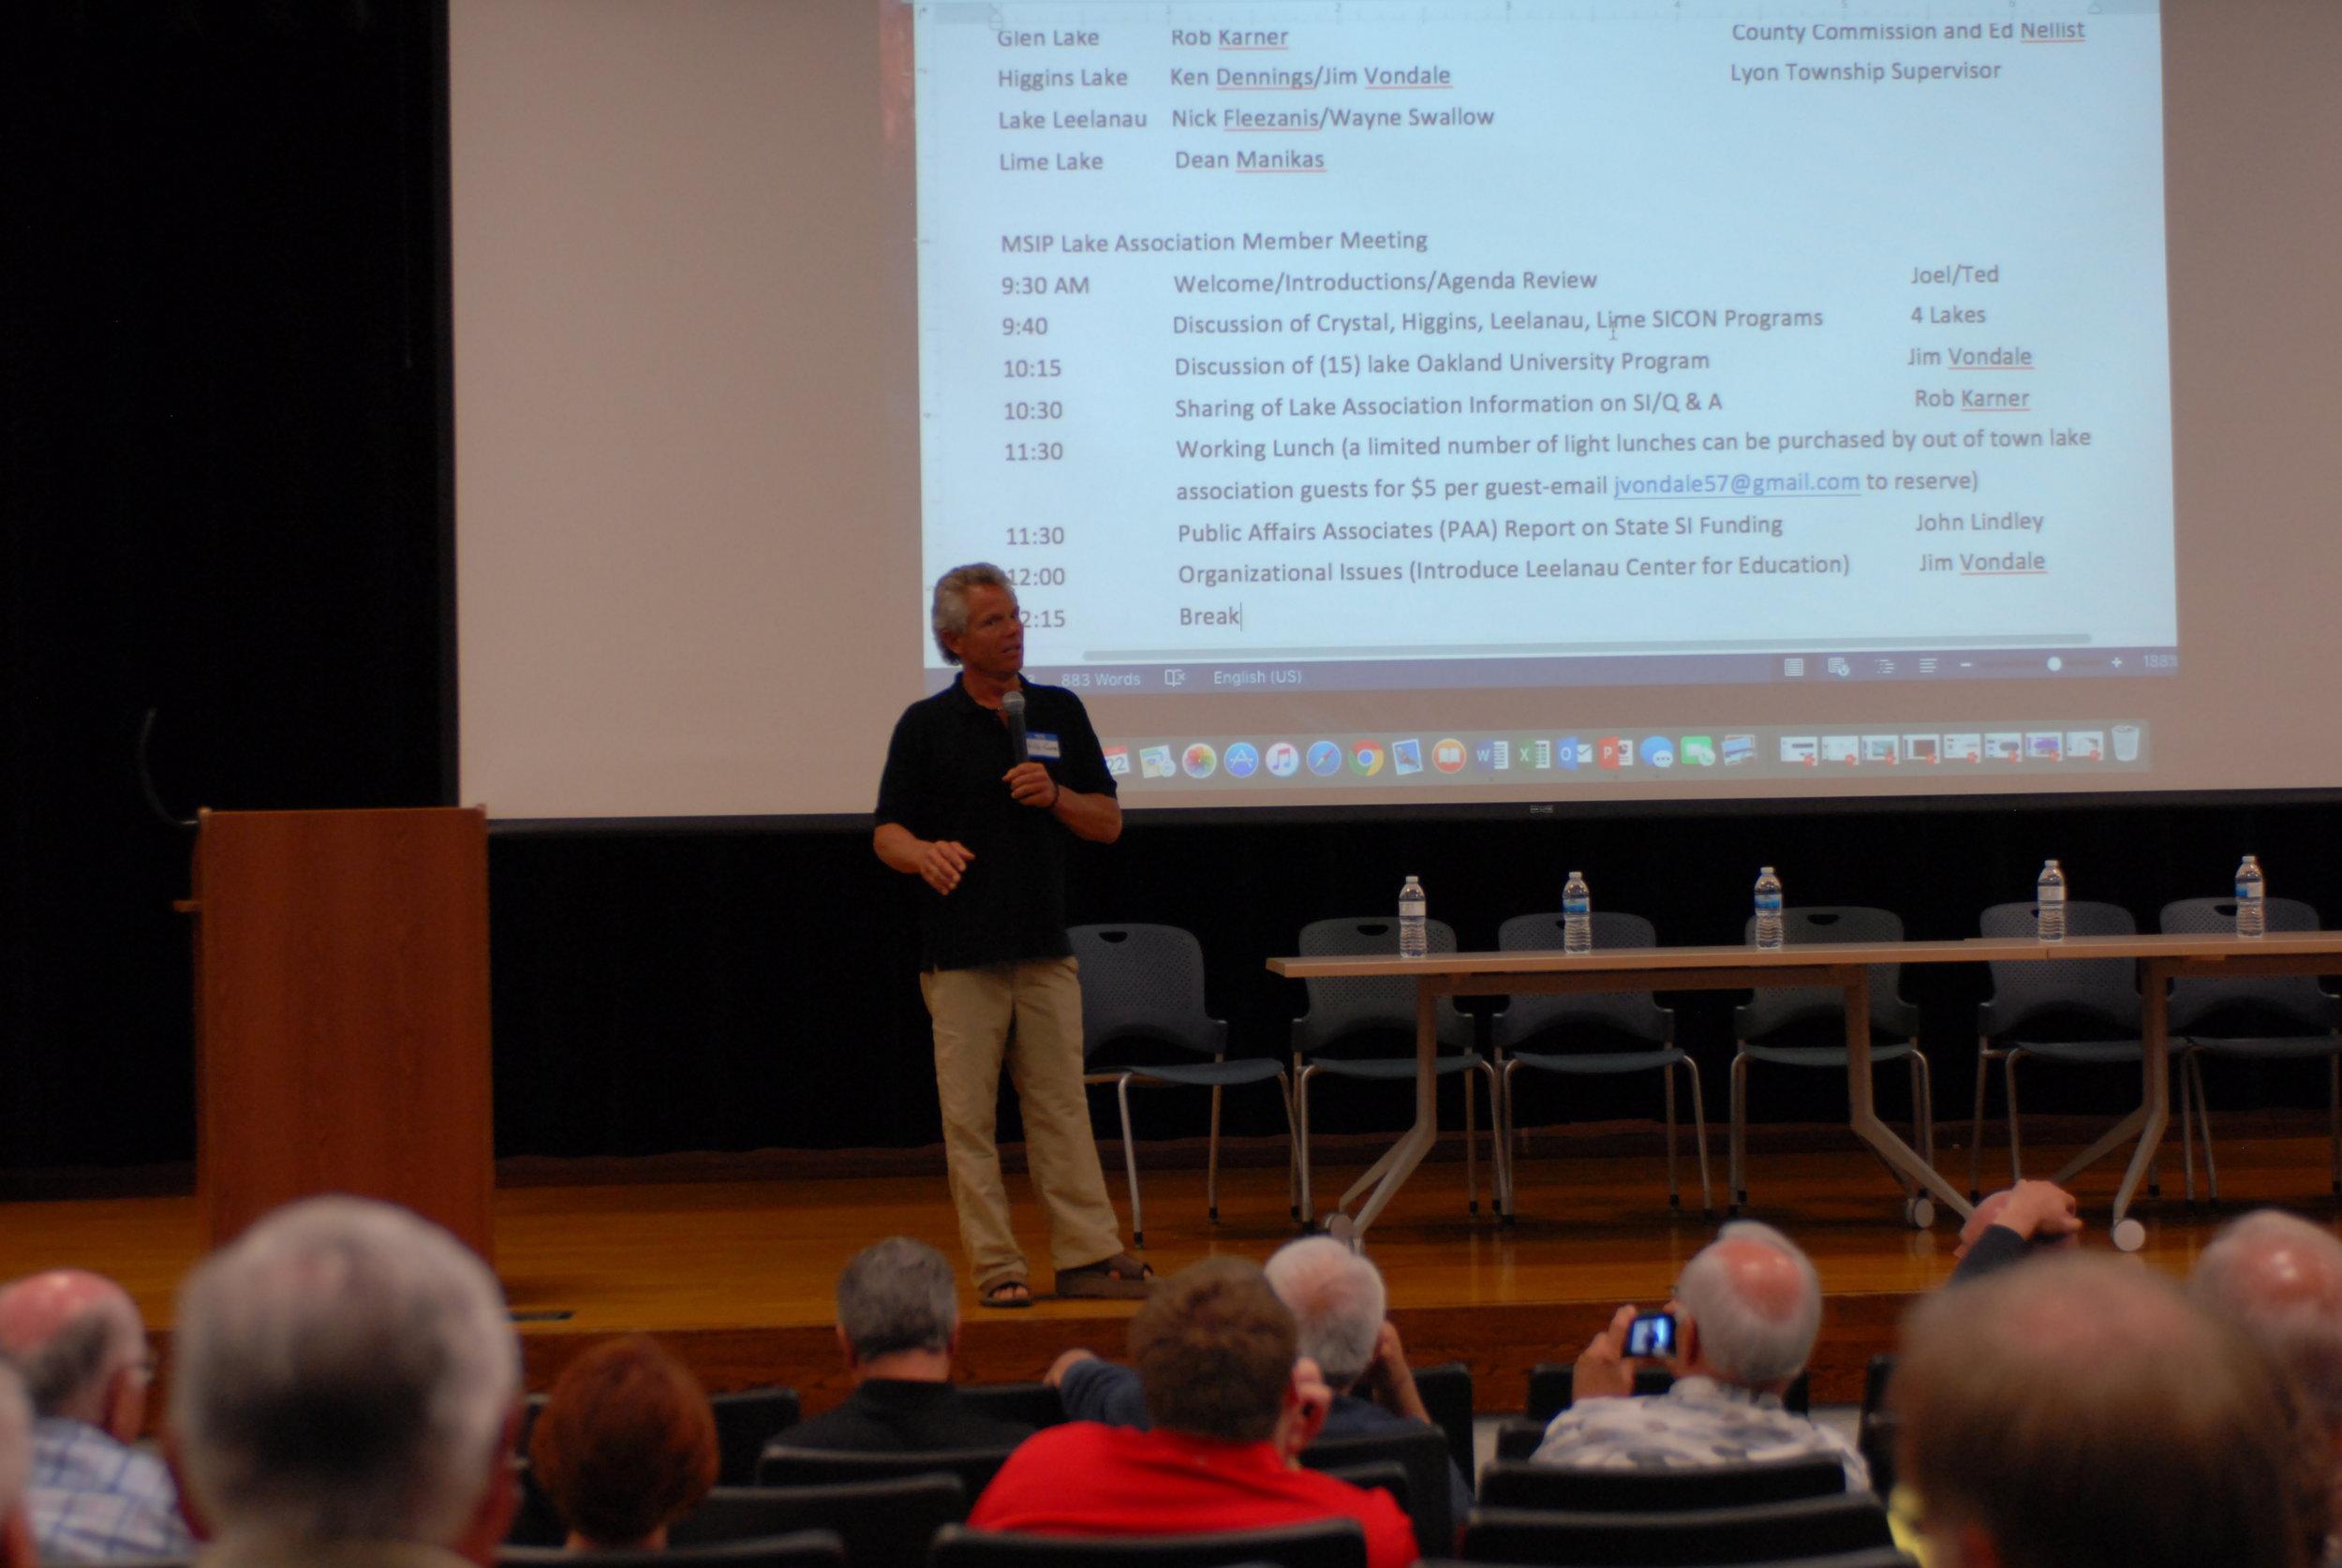 Rob Karner, Watershed Biologist, presents at MISIP Conference, June, 2016